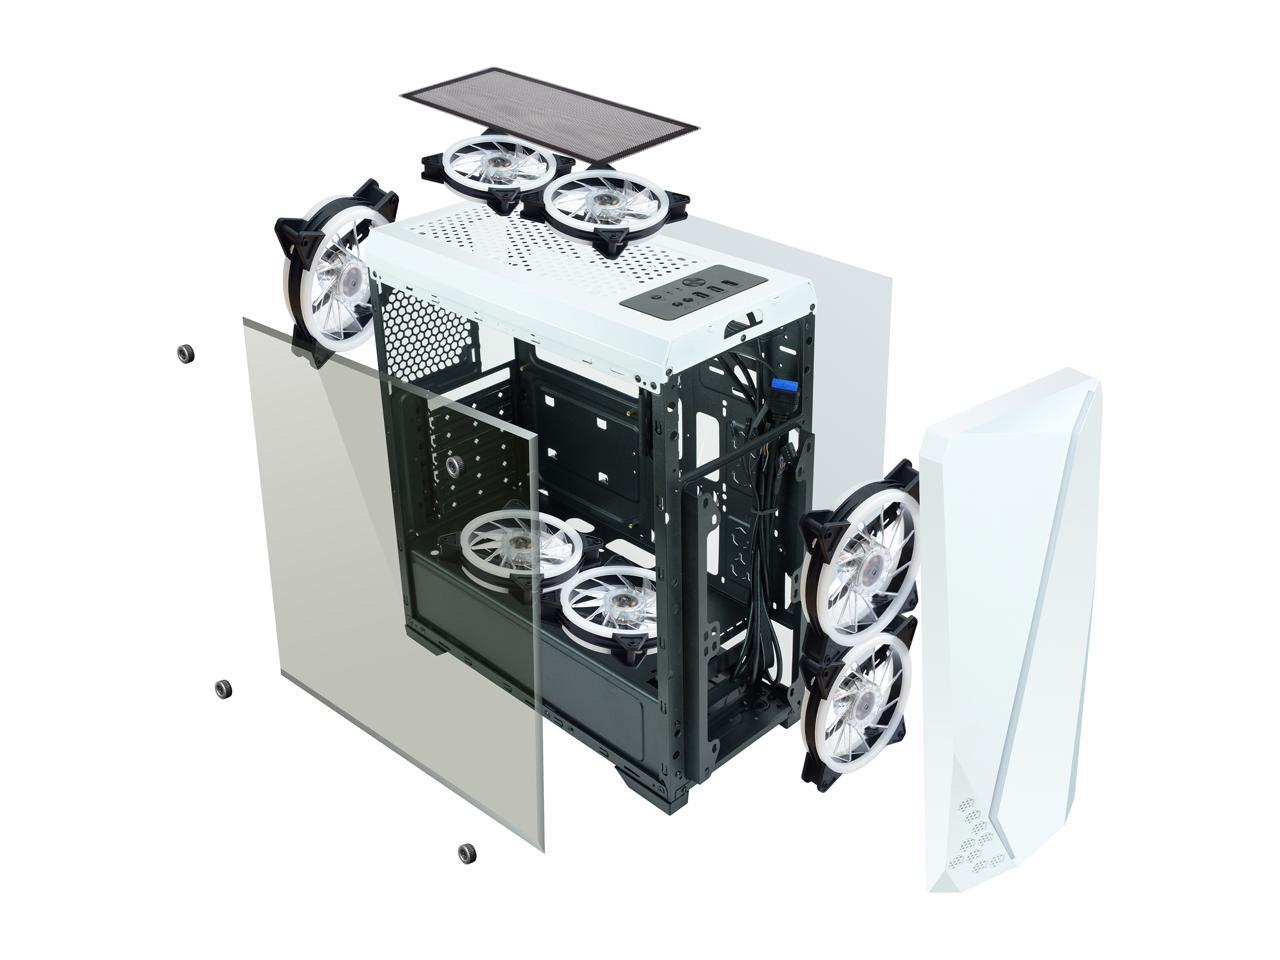 DIYPC S2-BK-RGB Black USB3.0 Steel// Tempered Glass ATX Mid Tower Gaming Computer